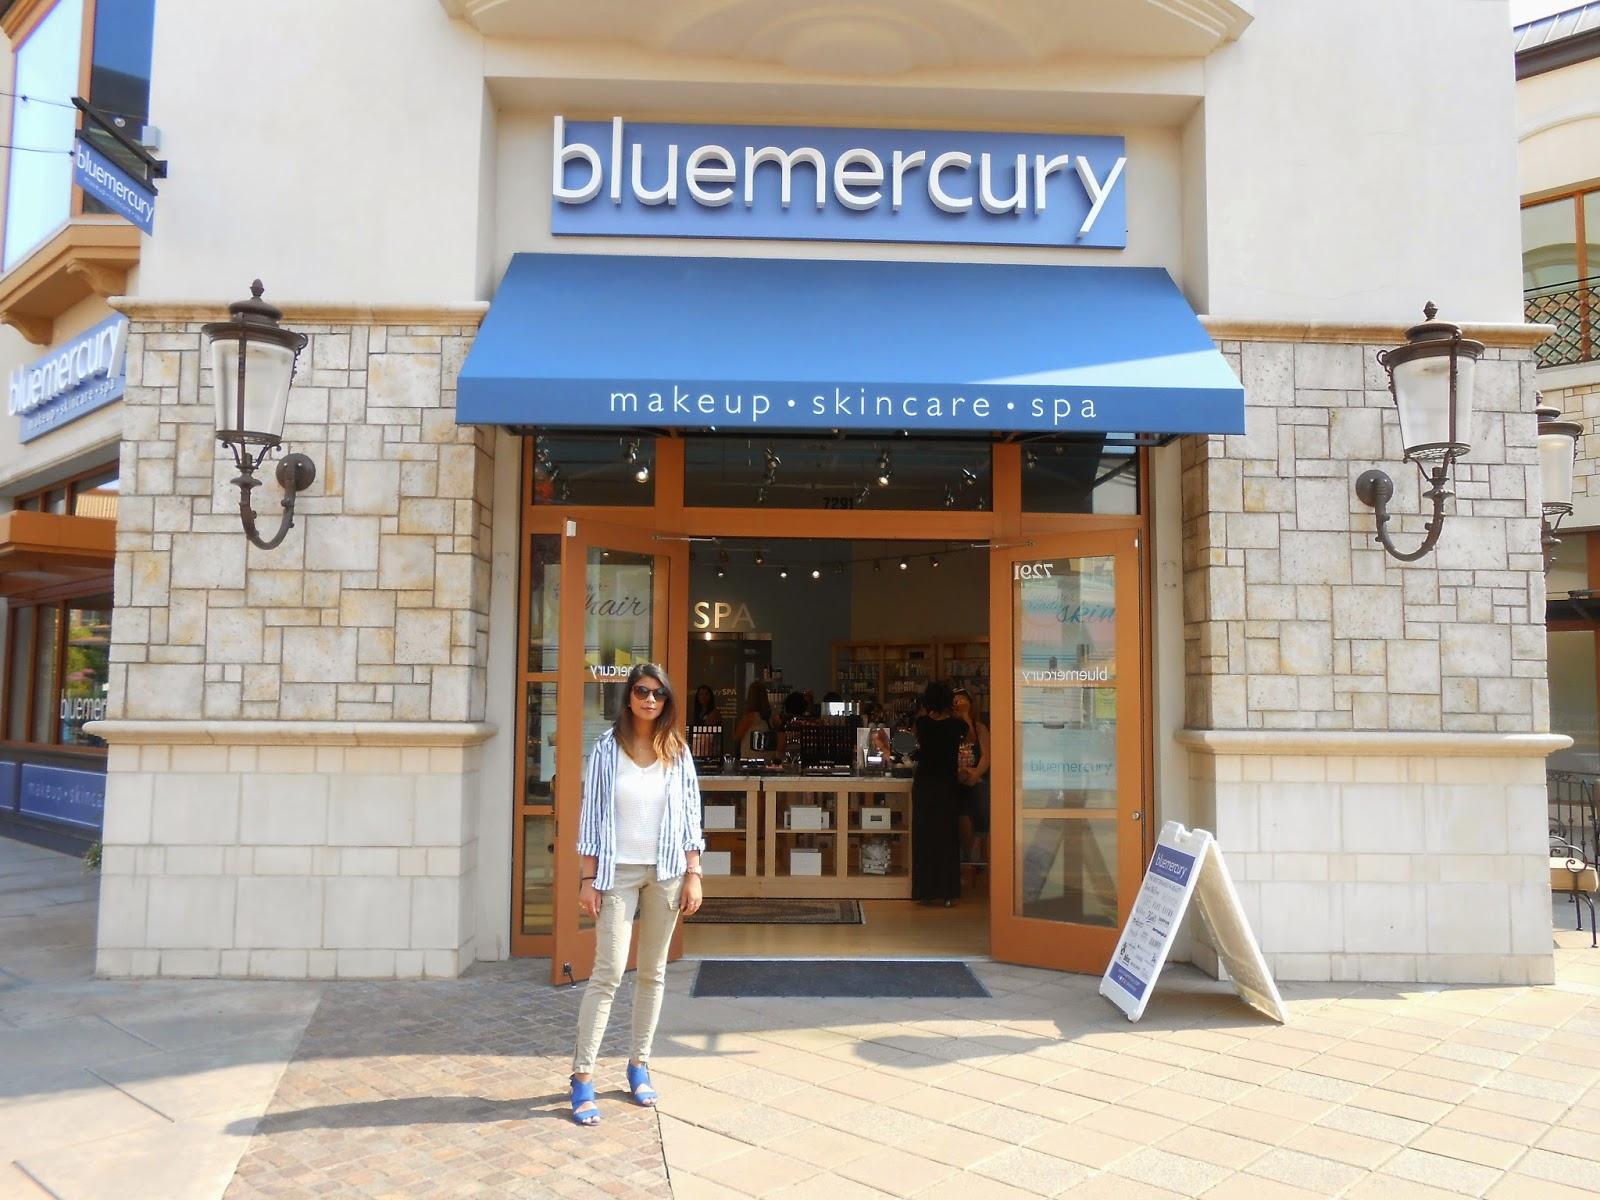 blue mercury portland, portland blogger, fashion, beauty, spa bridgeport, filipino fashionista, street style